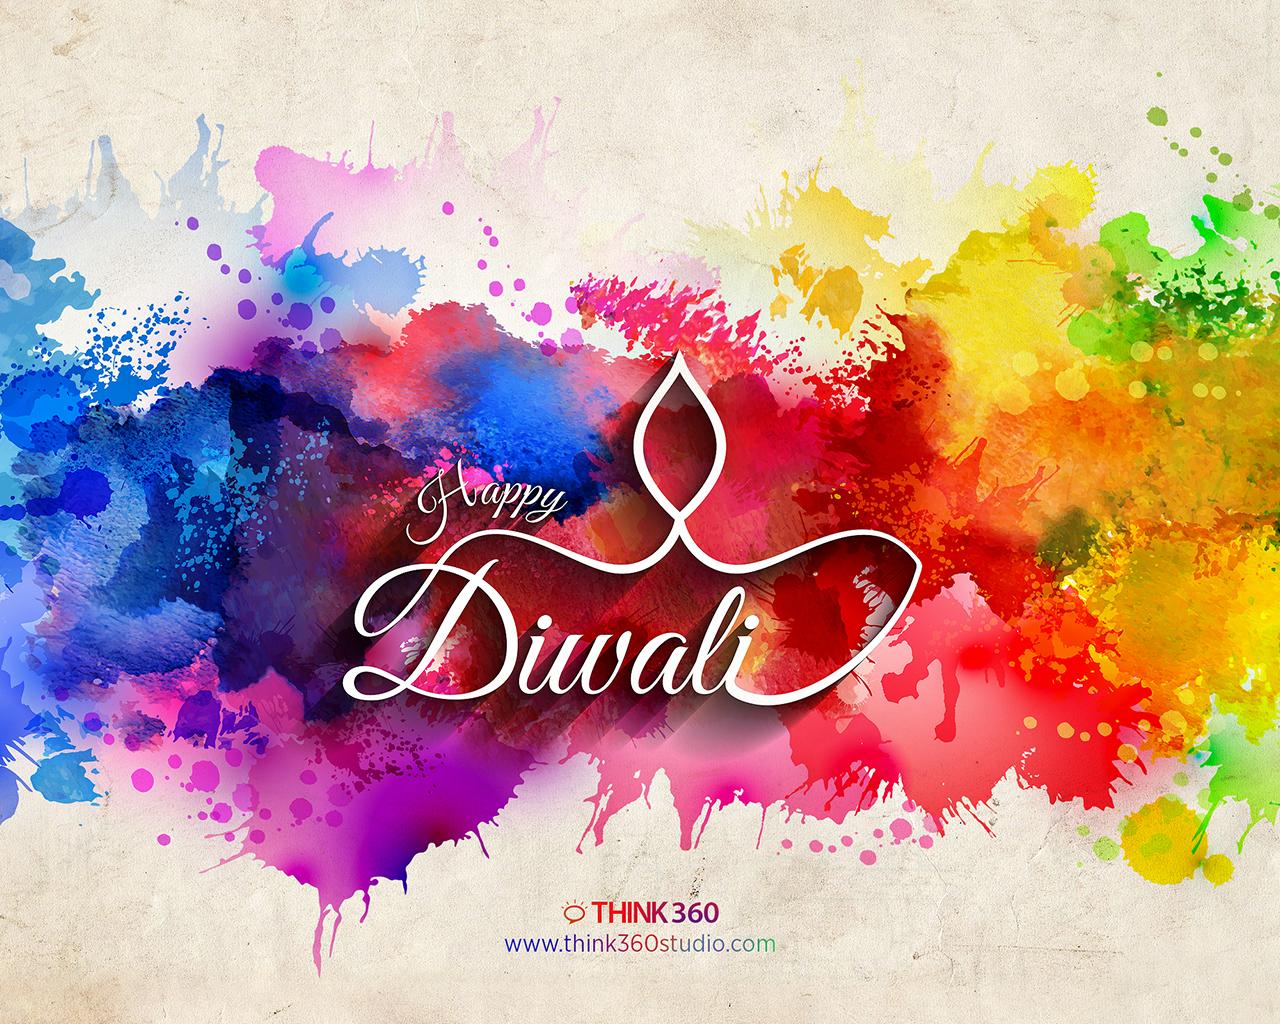 Download Wallpaper Mobile Diwali - diwali_wallpaper_2014_1280x1024_by_princepal-d836hii  Gallery_123128.jpg